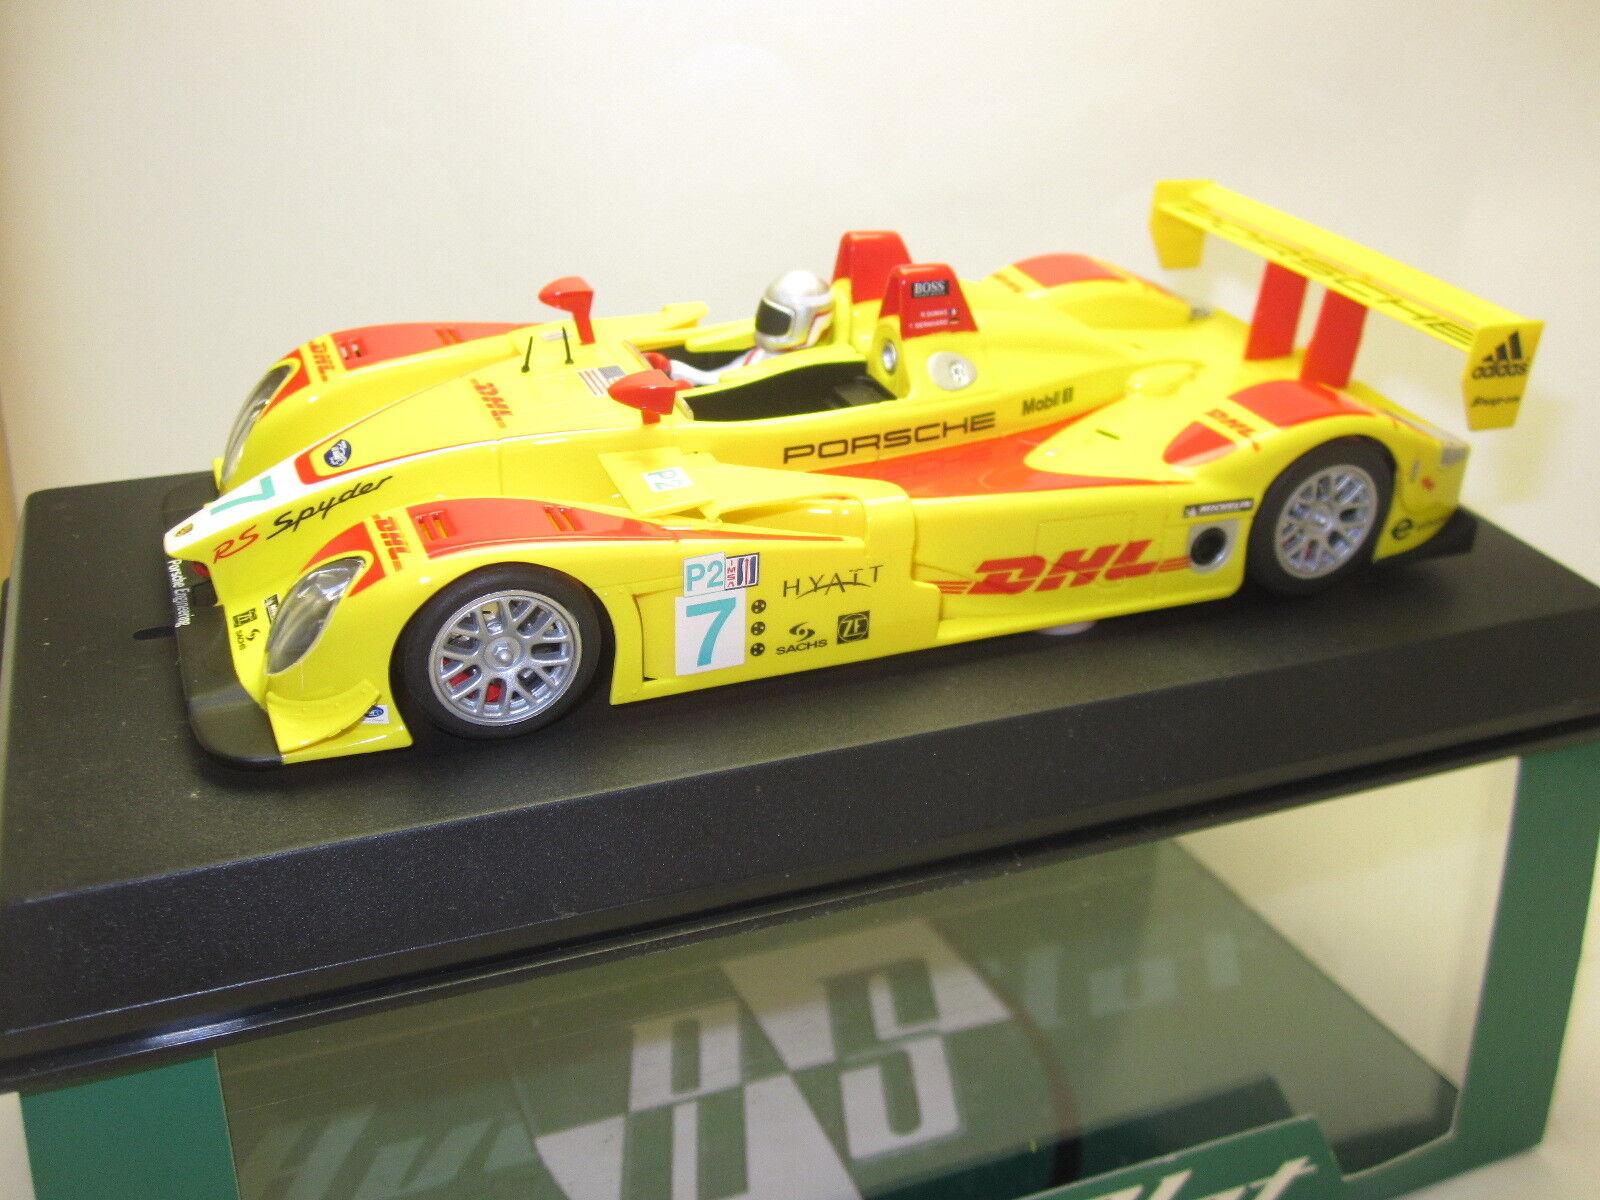 Slot Car Avant Avant Avant Slot 50603 Porsche Spyder Le mans 2008 Compatible 1 32 Scalextric  compra en línea hoy